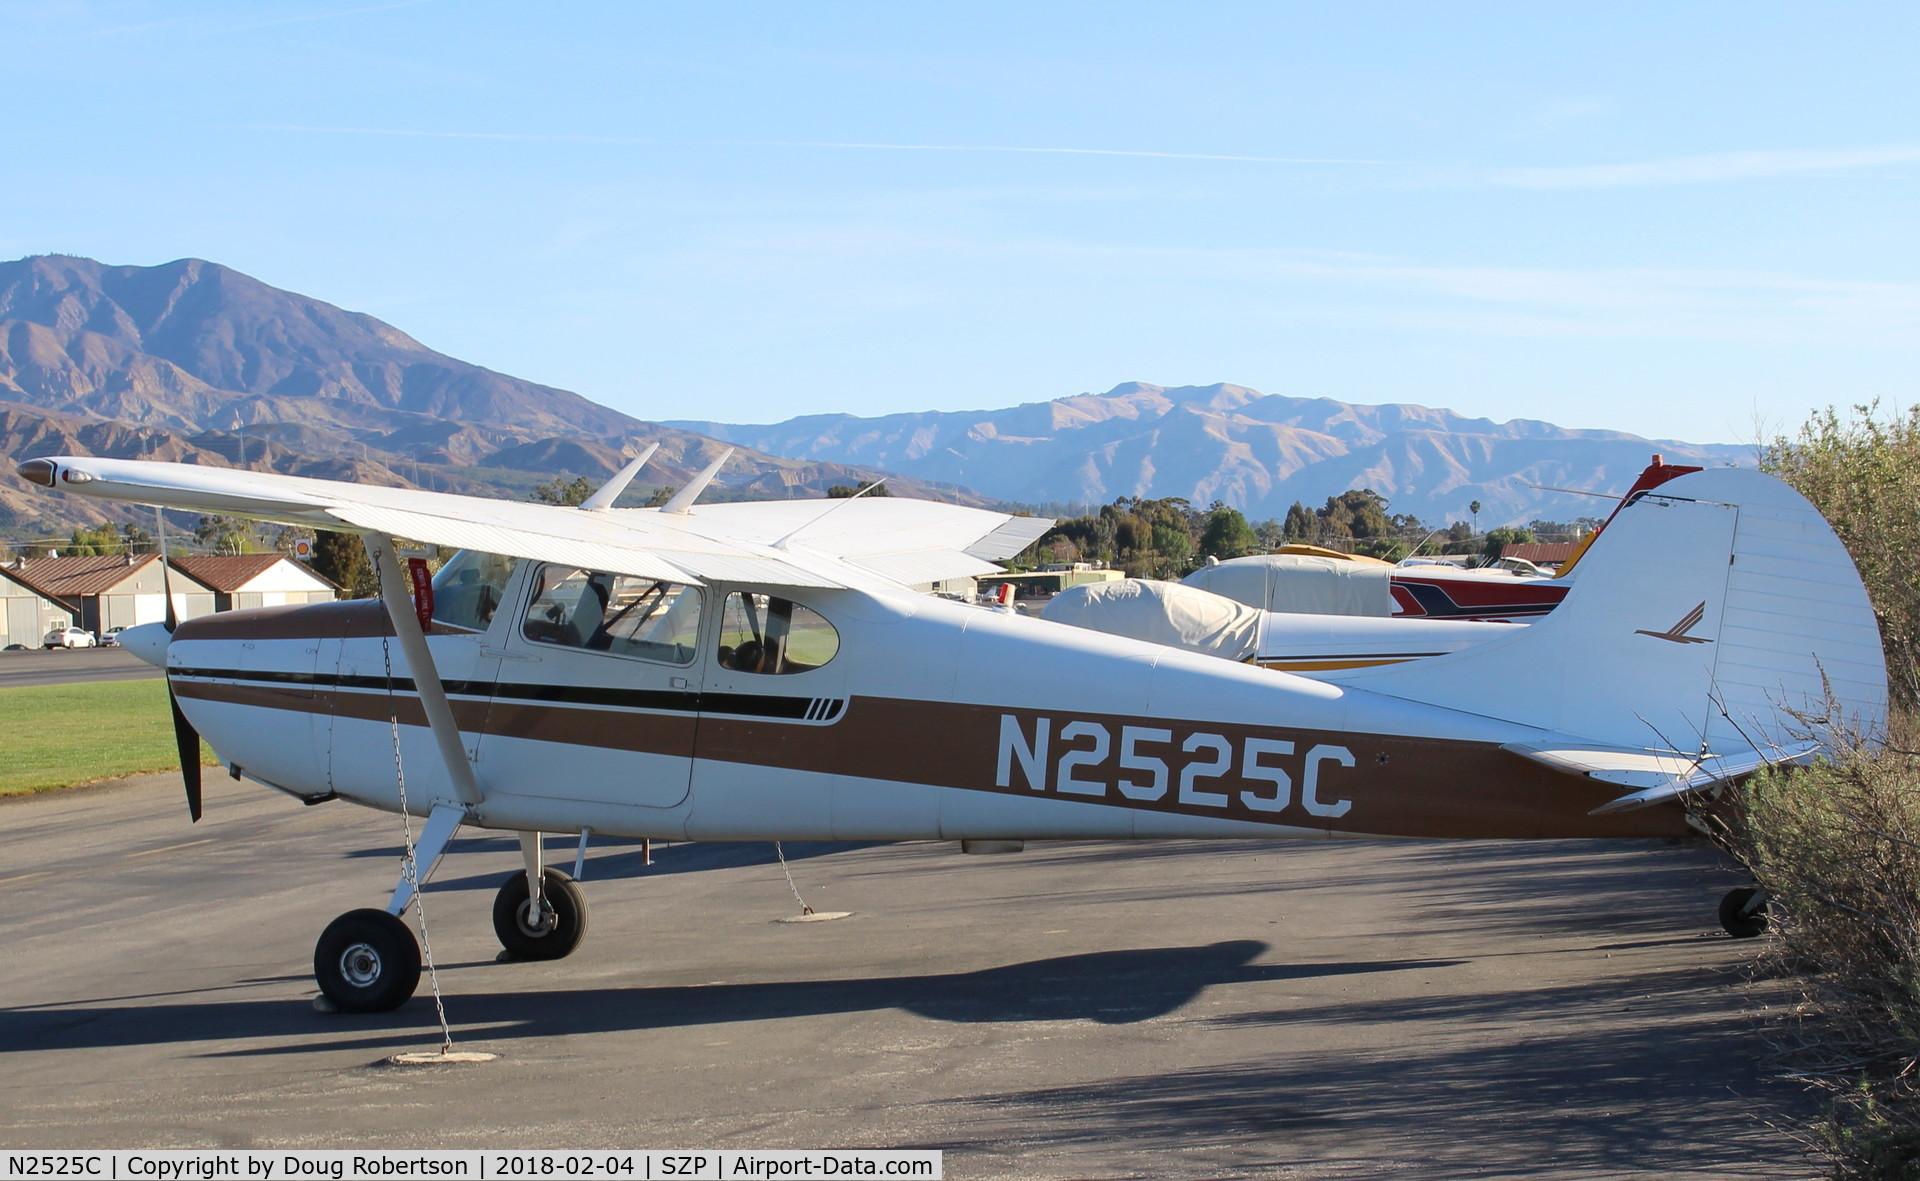 N2525C, 1954 Cessna 170B C/N 26169, 1954 Cessna 170B, Continental C145 145 Hp